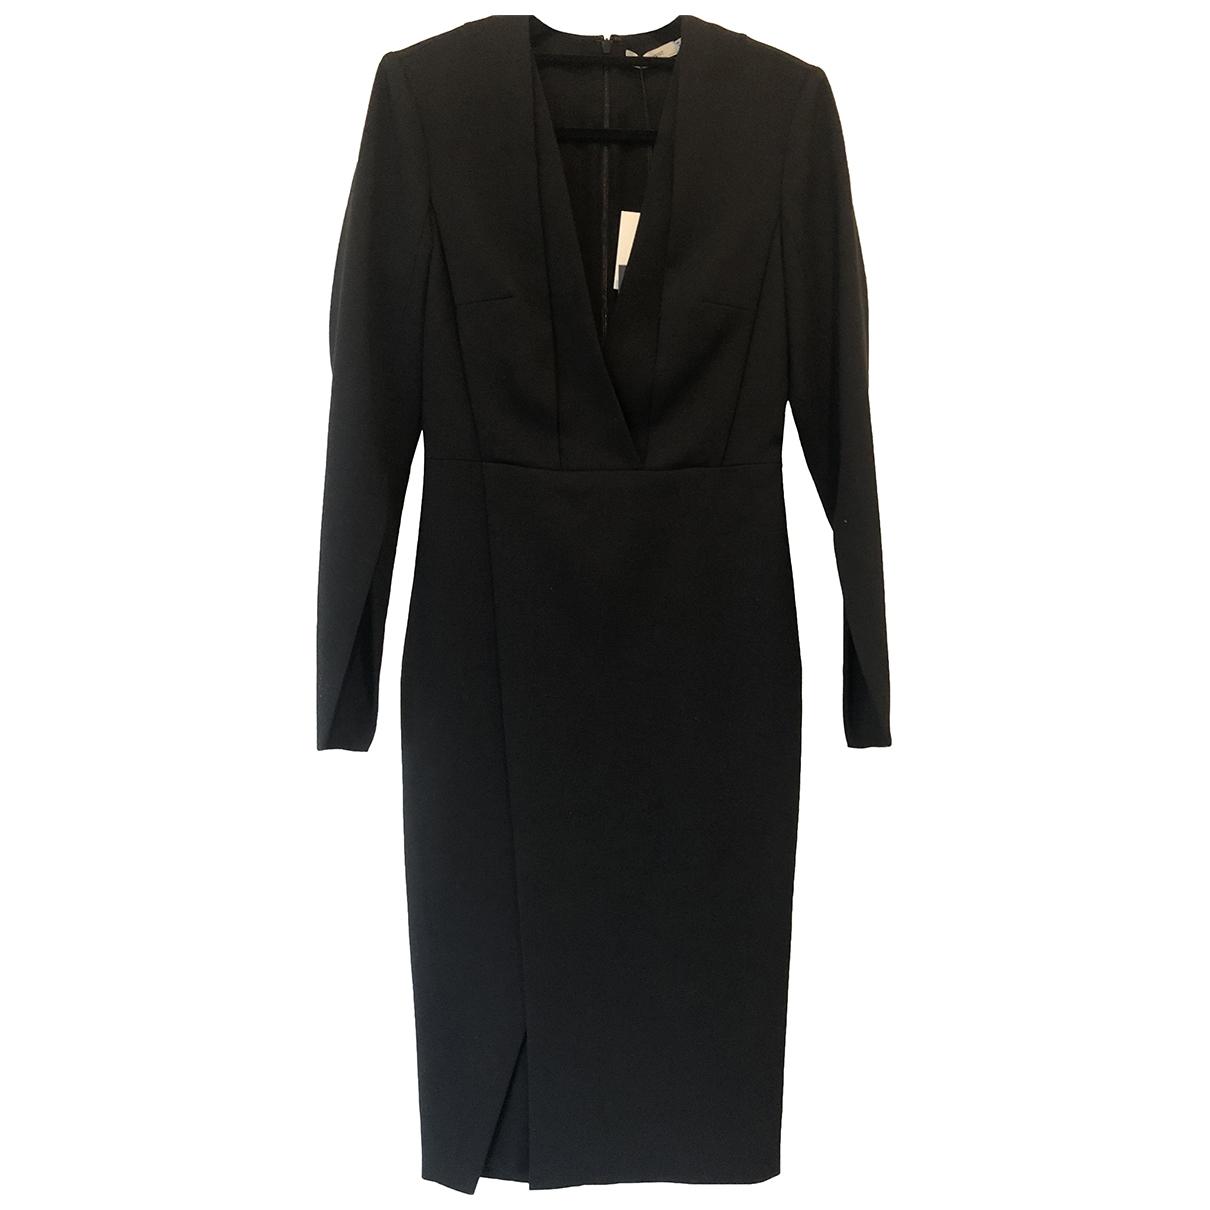 Protagonist \N Kleid in  Schwarz Baumwolle